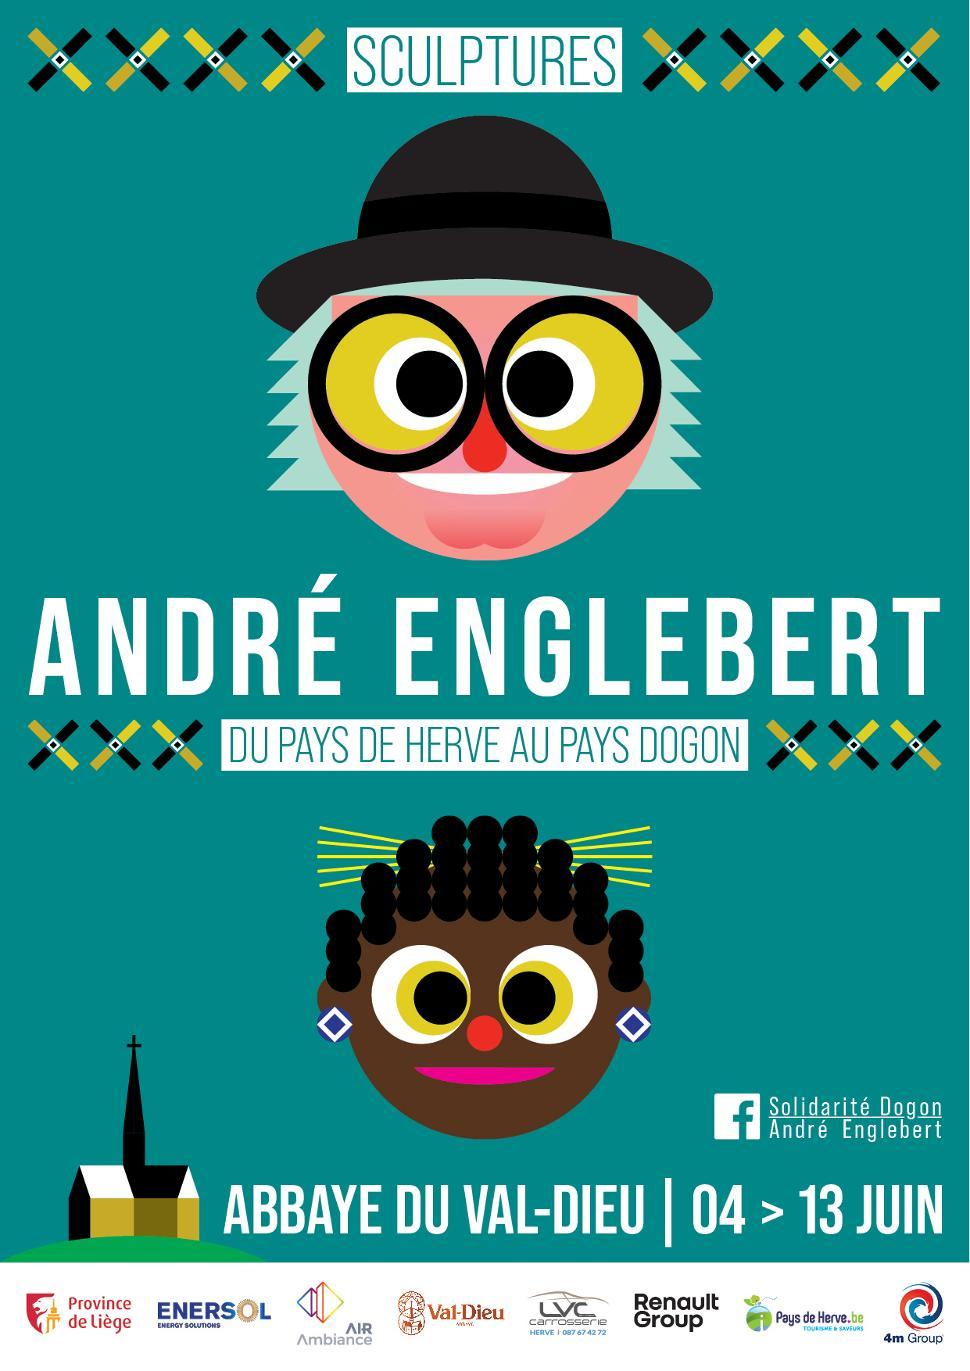 Expo André Englebert ©Solidarité Dogon 05-2021